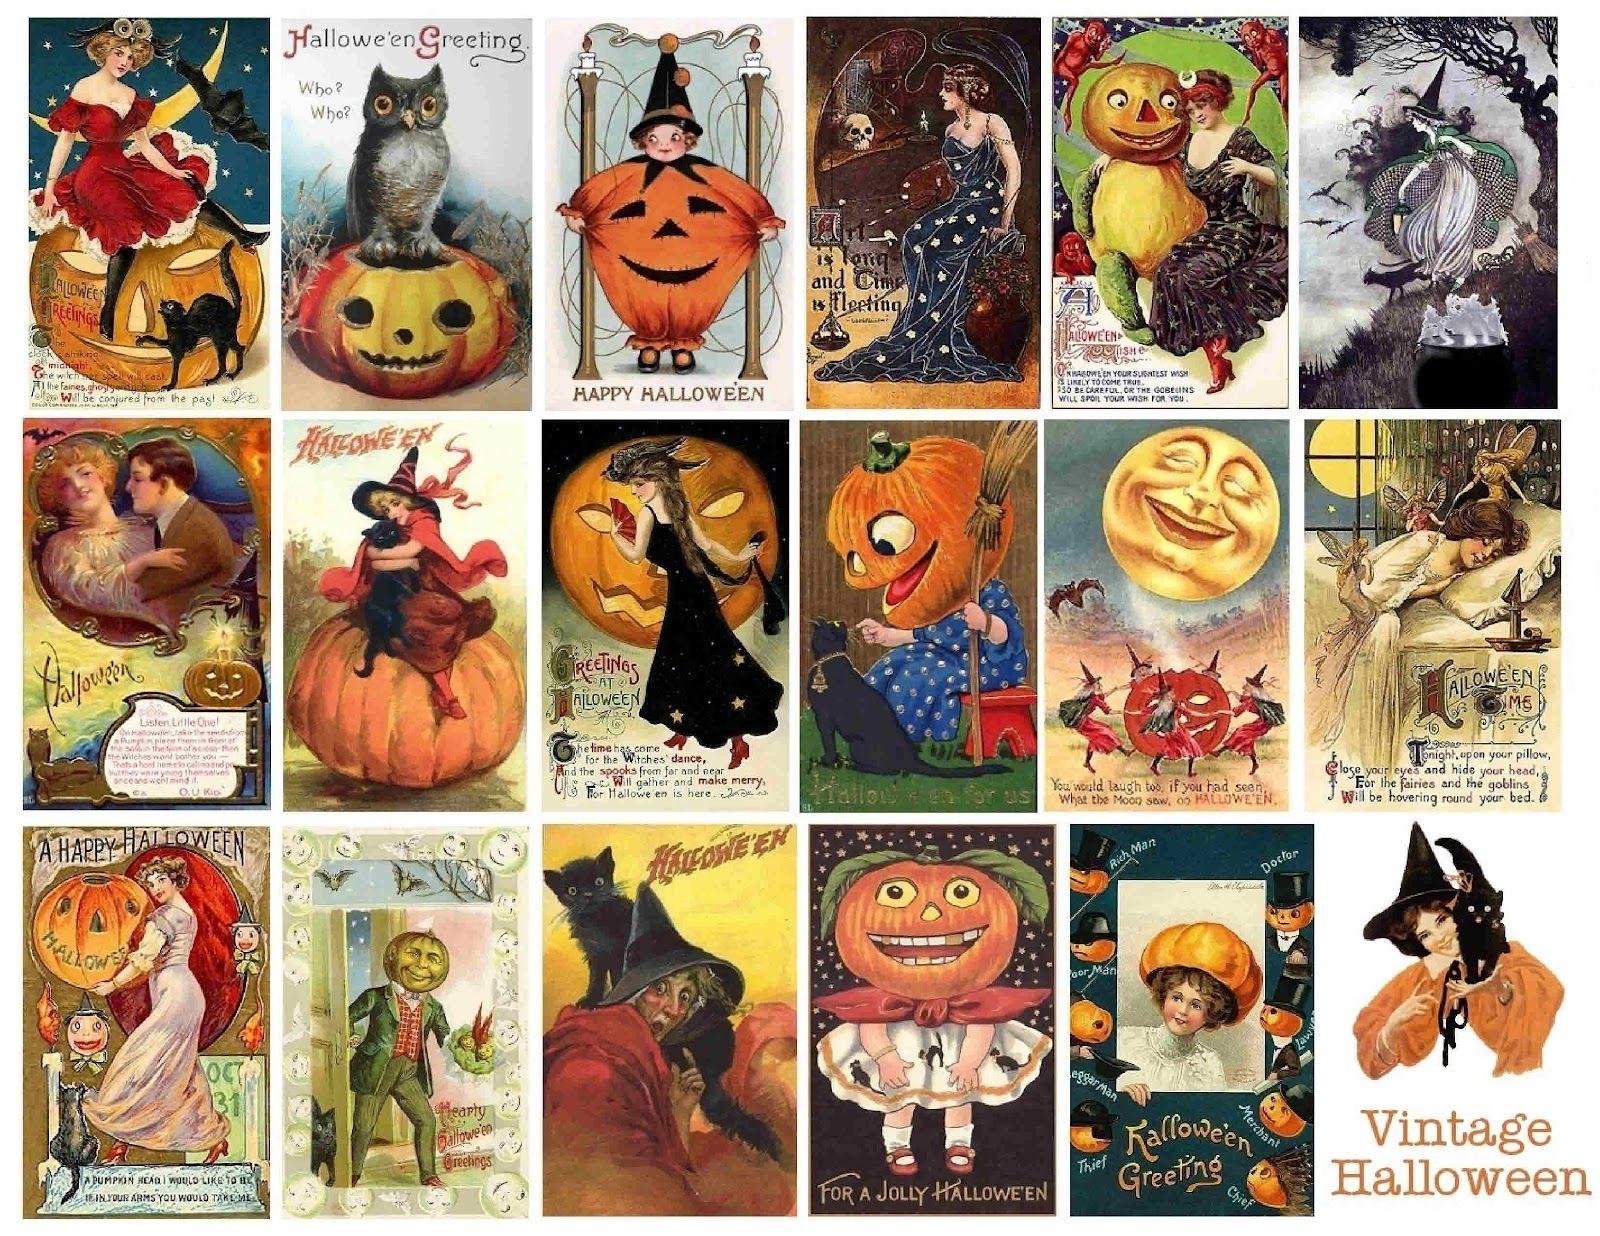 Free Vintage Printable - Halloween Collage Sheet {300 Dpi} | More - Free Printable Vintage Halloween Images